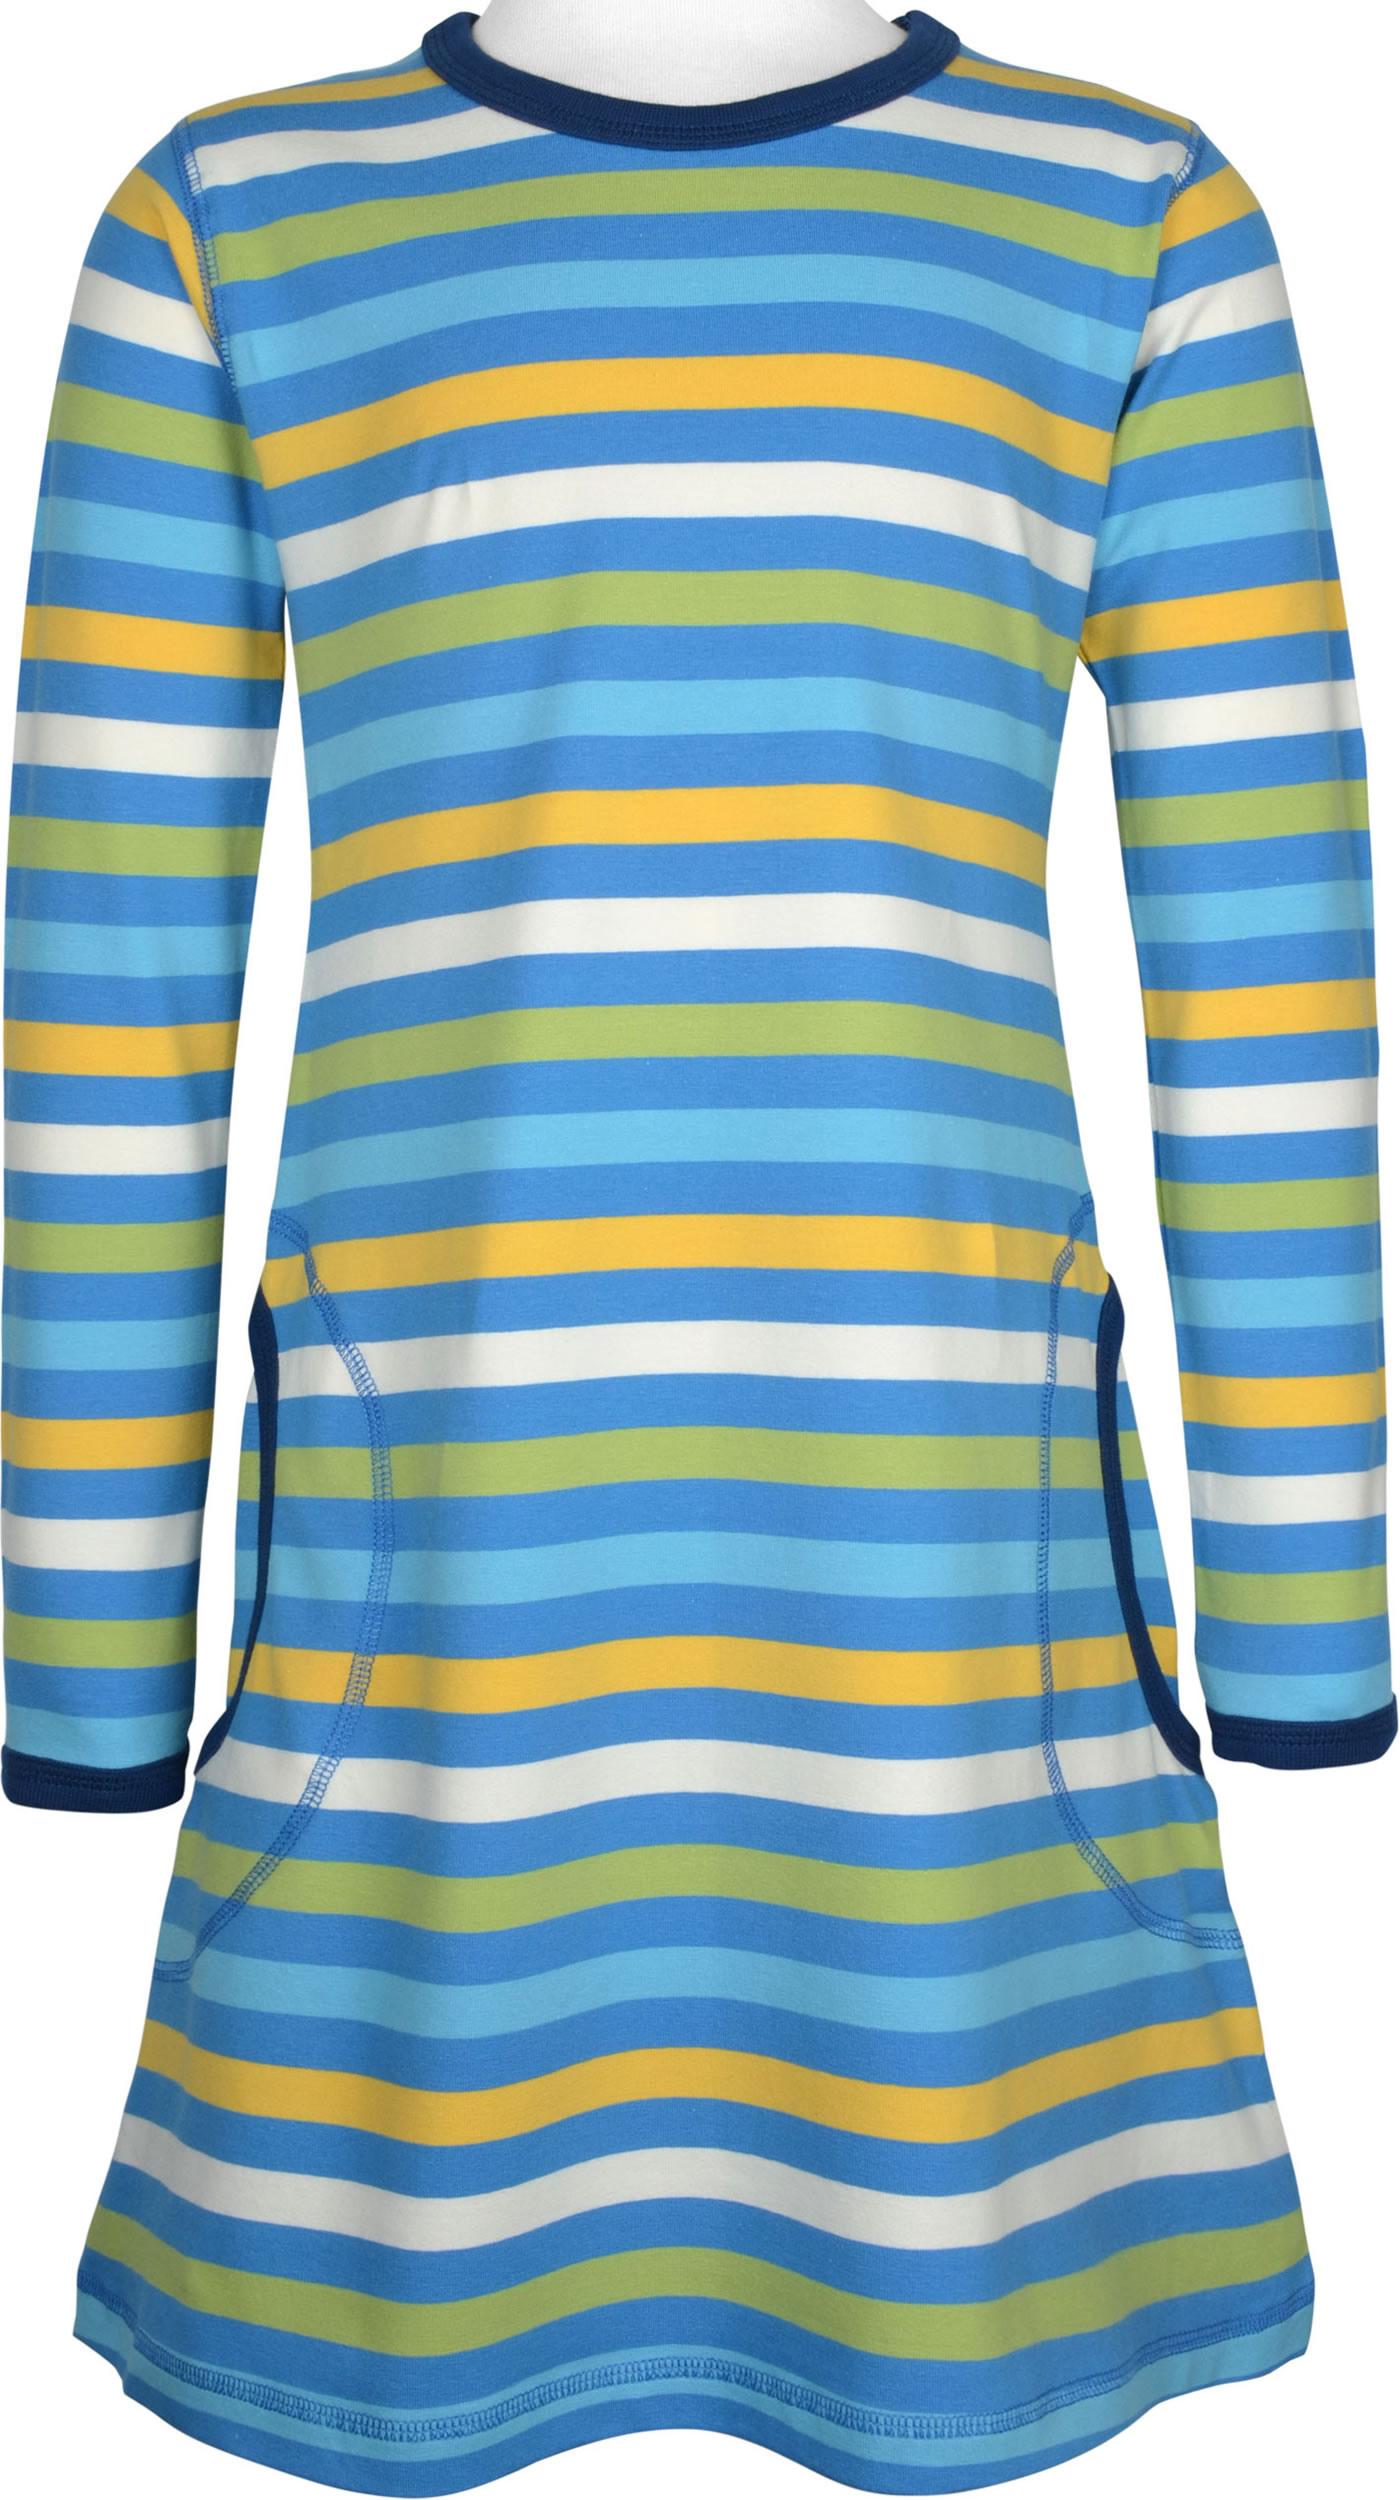 Formal Perfekt Kleid Blau Gelb Galerie Perfekt Kleid Blau Gelb Galerie